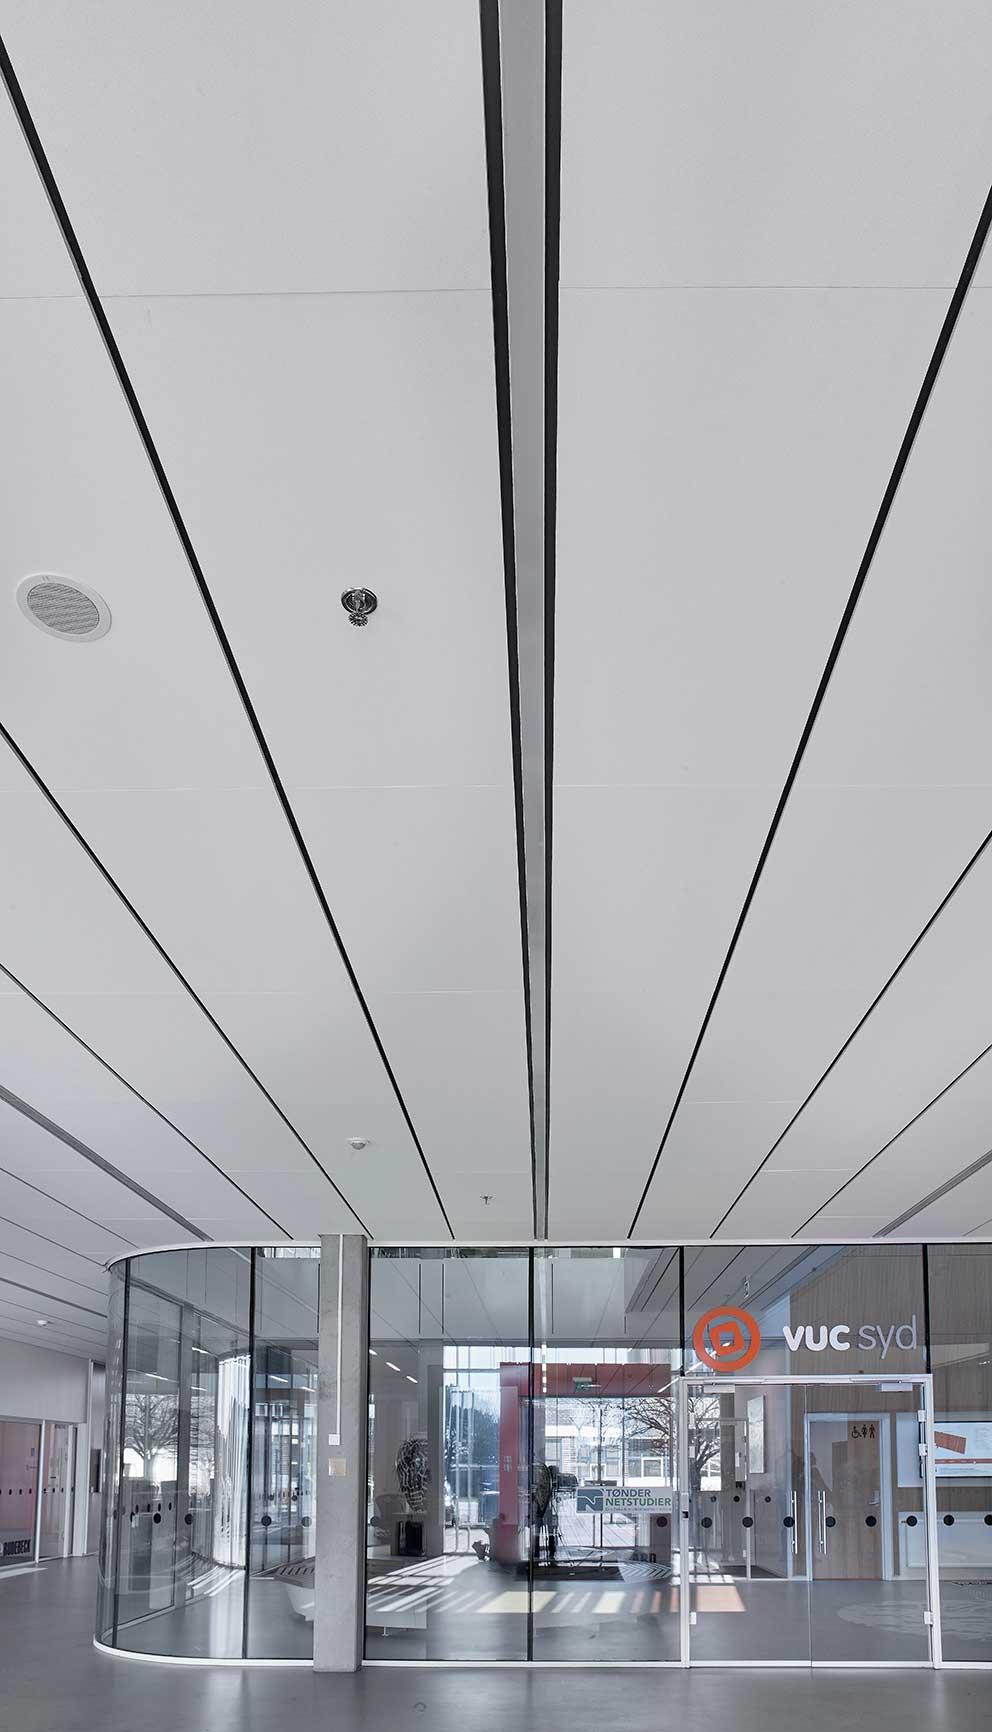 Matric Recessed Frameless F3 indbygget i loftet ved indgangen - Luminex